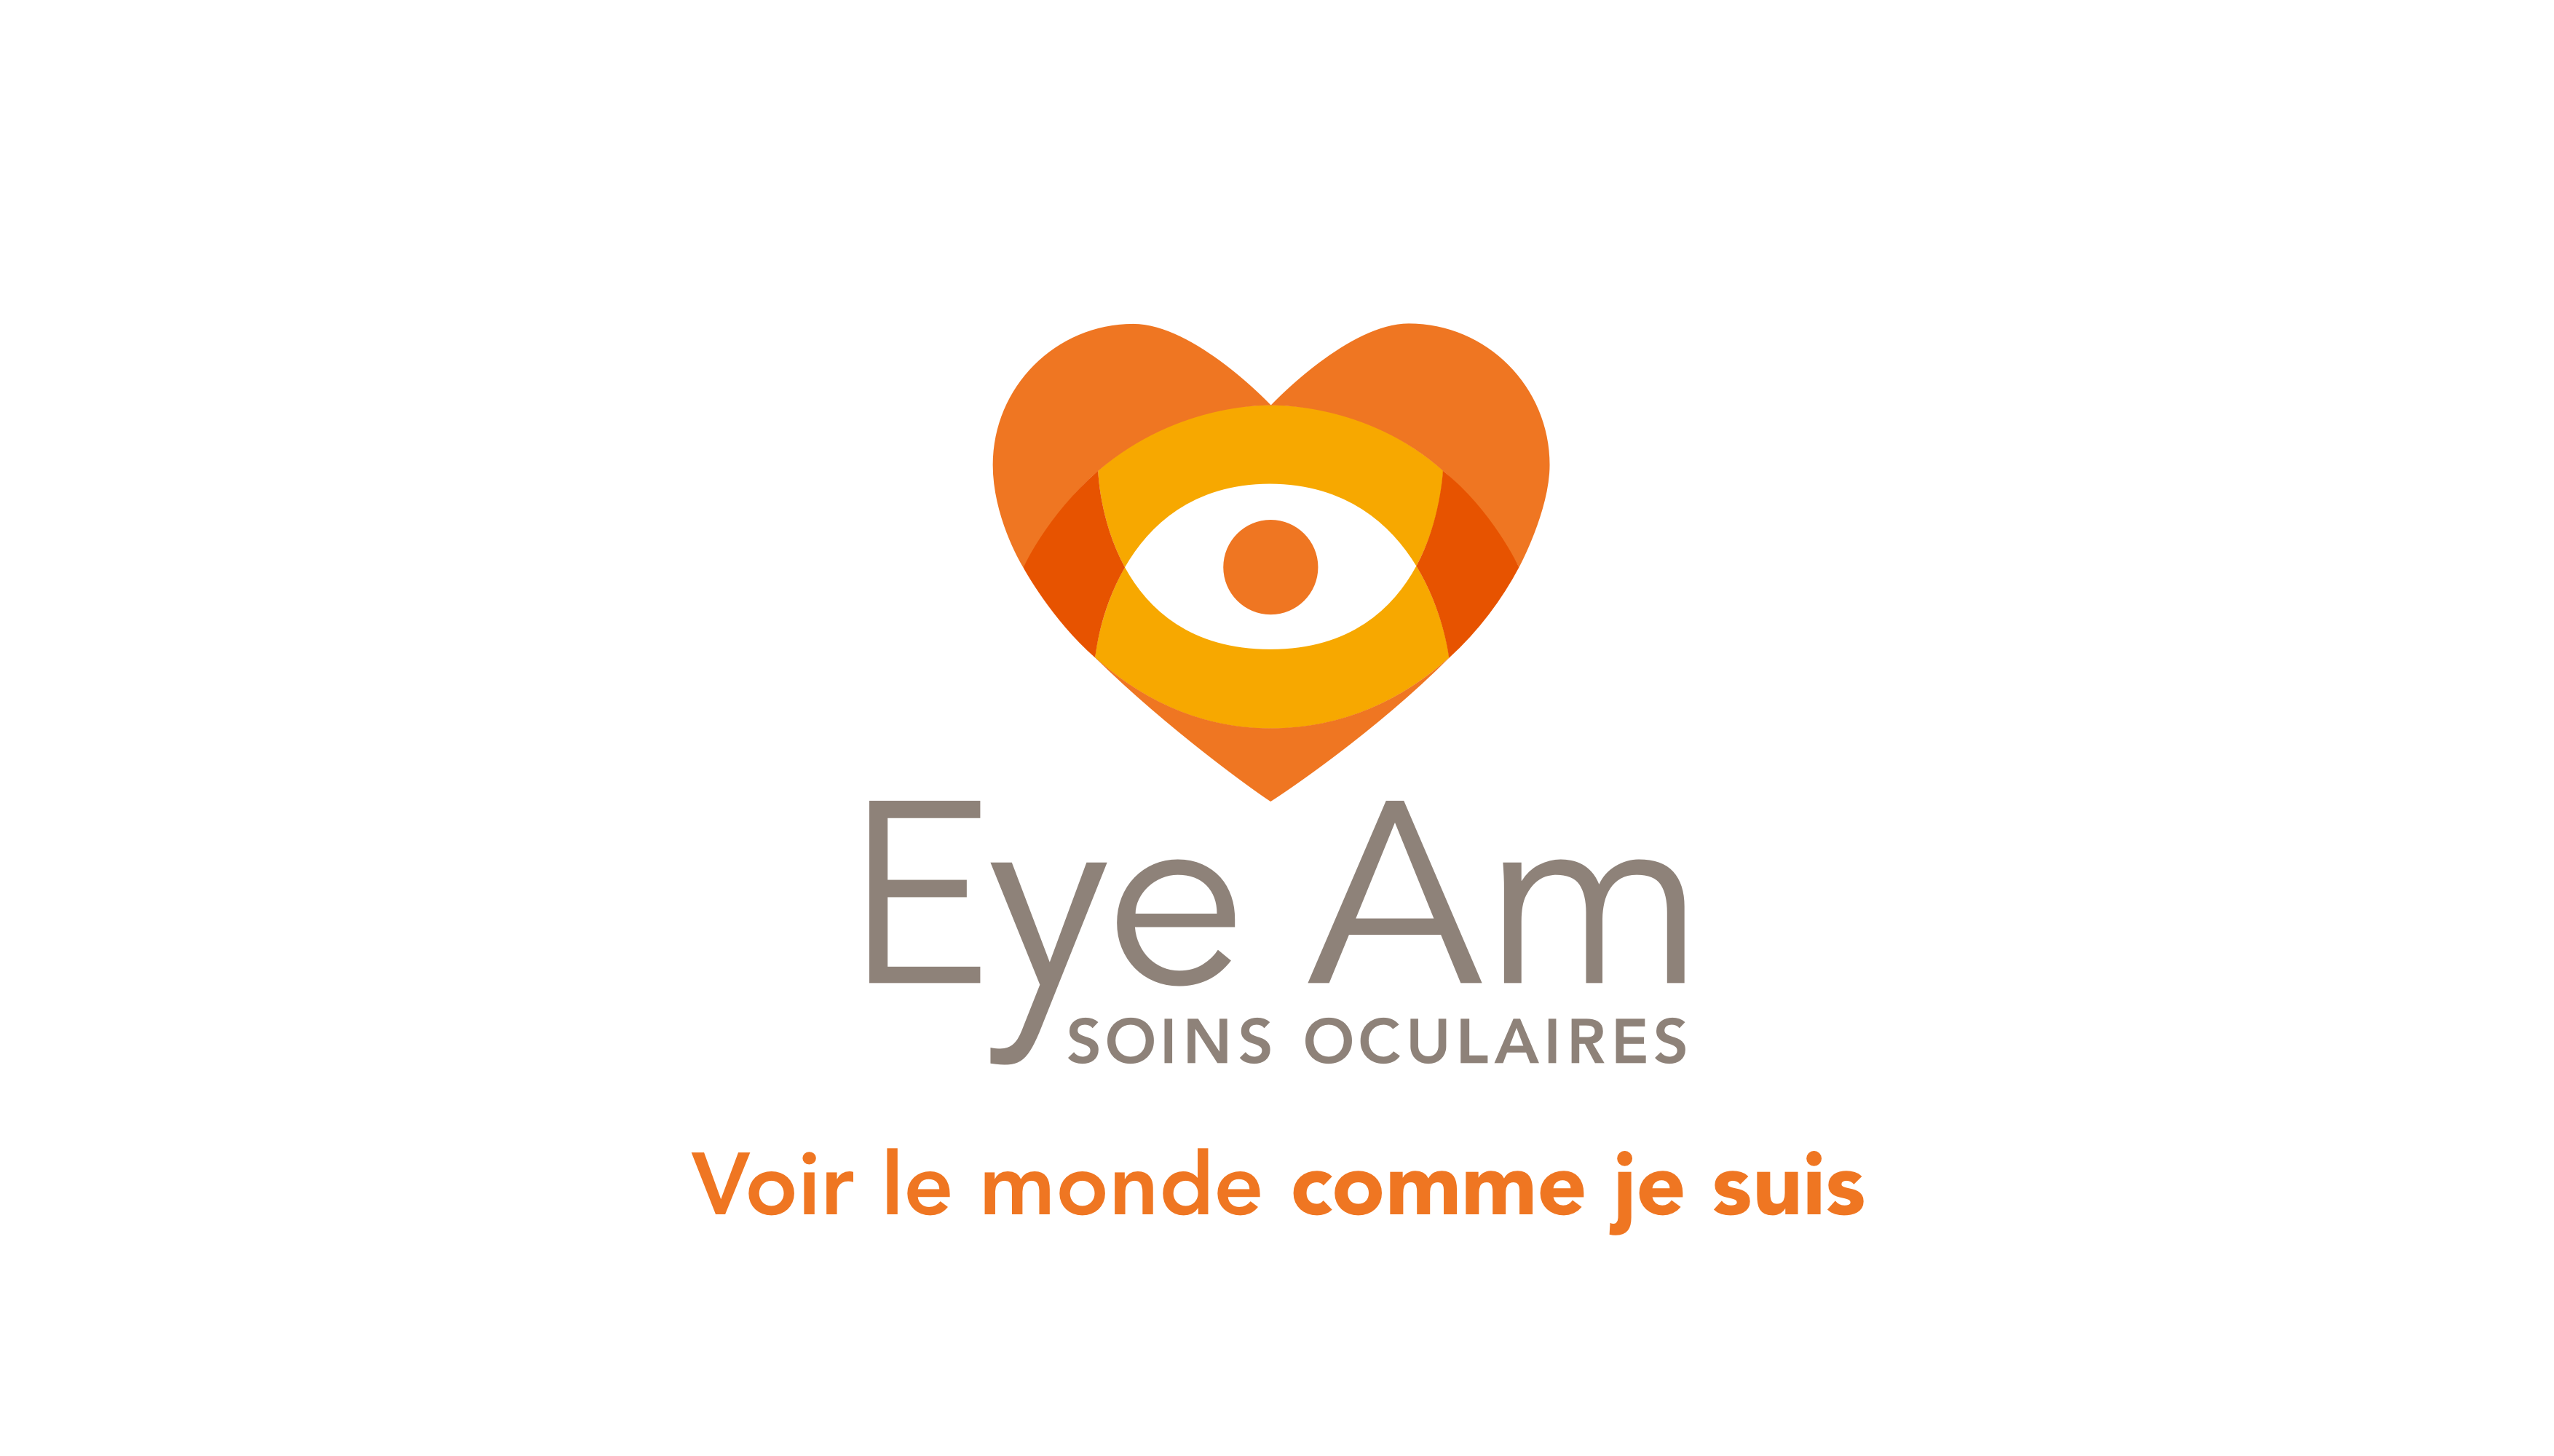 3 – Logo